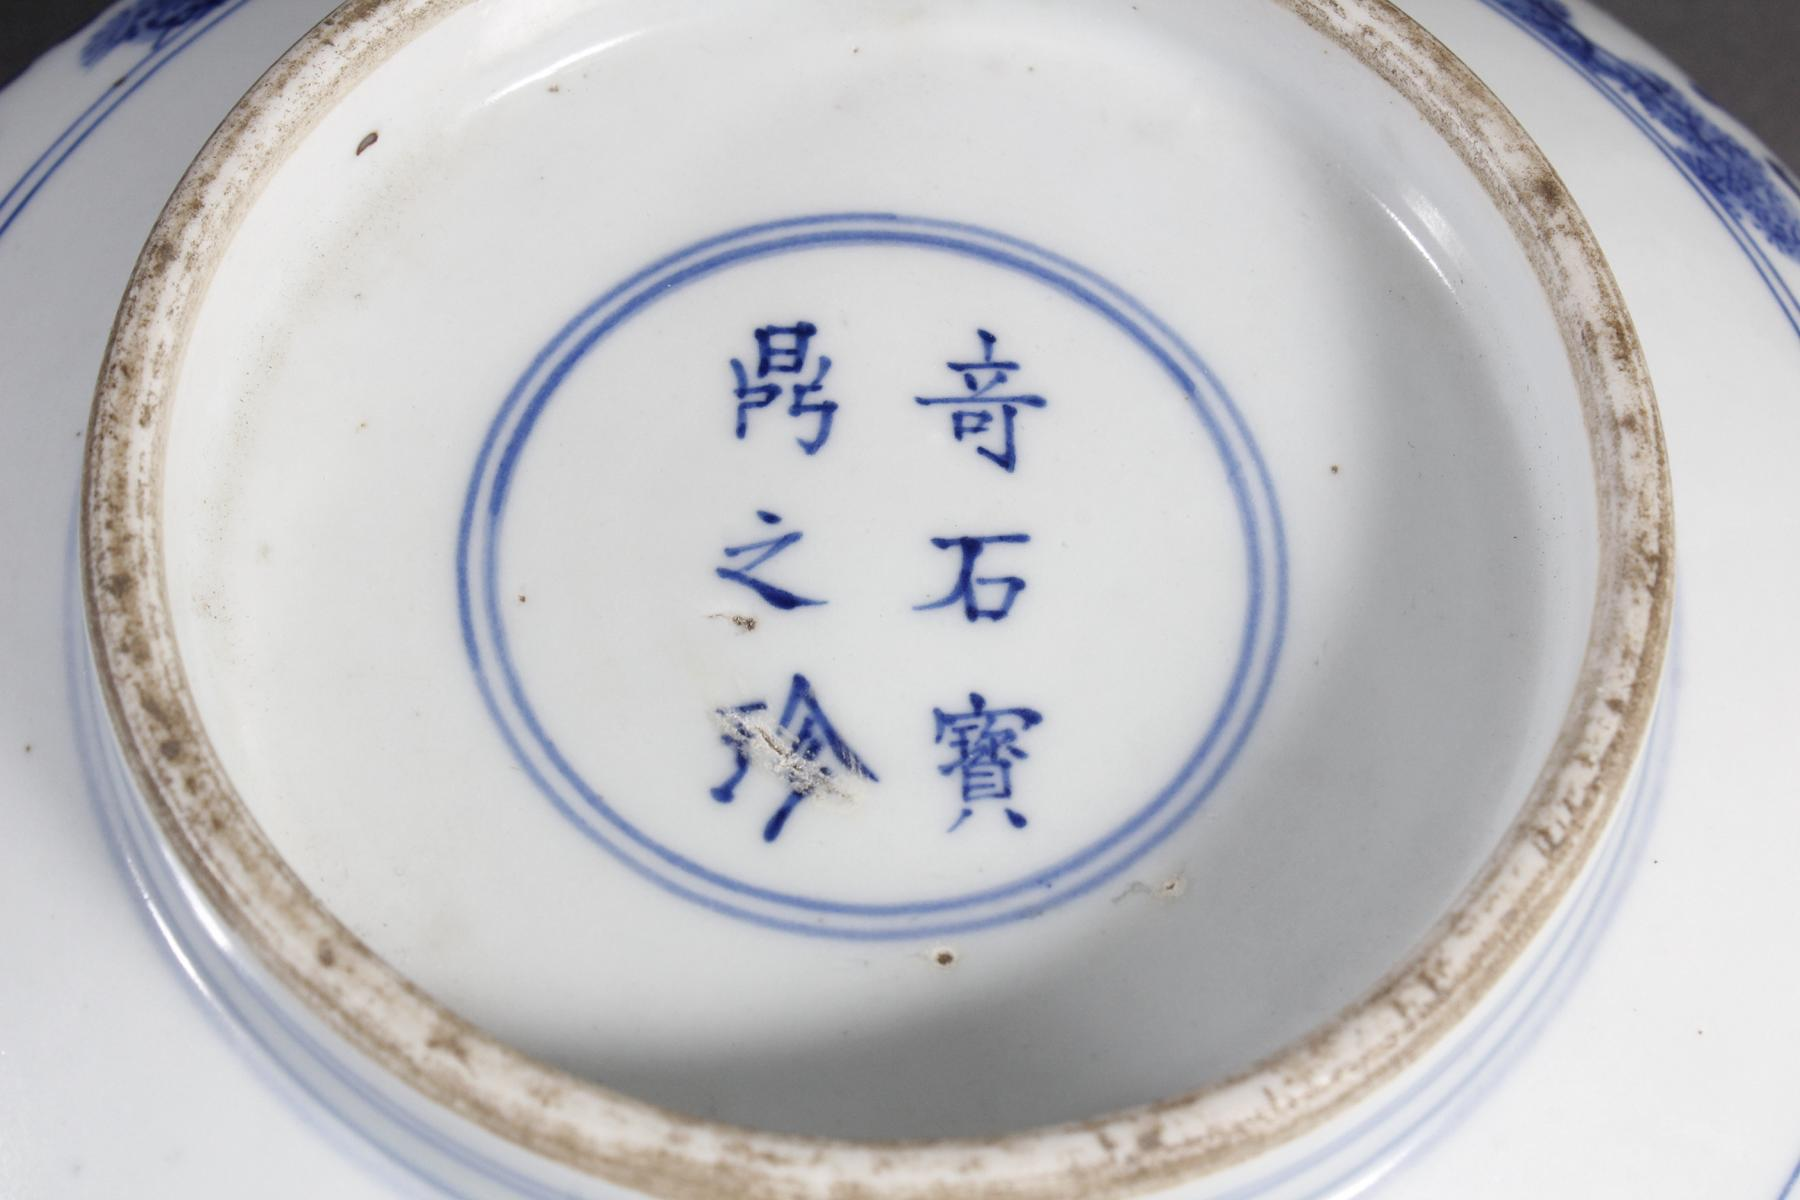 Porzellan-Kumme, China wohl 19. Jahrhundert-8